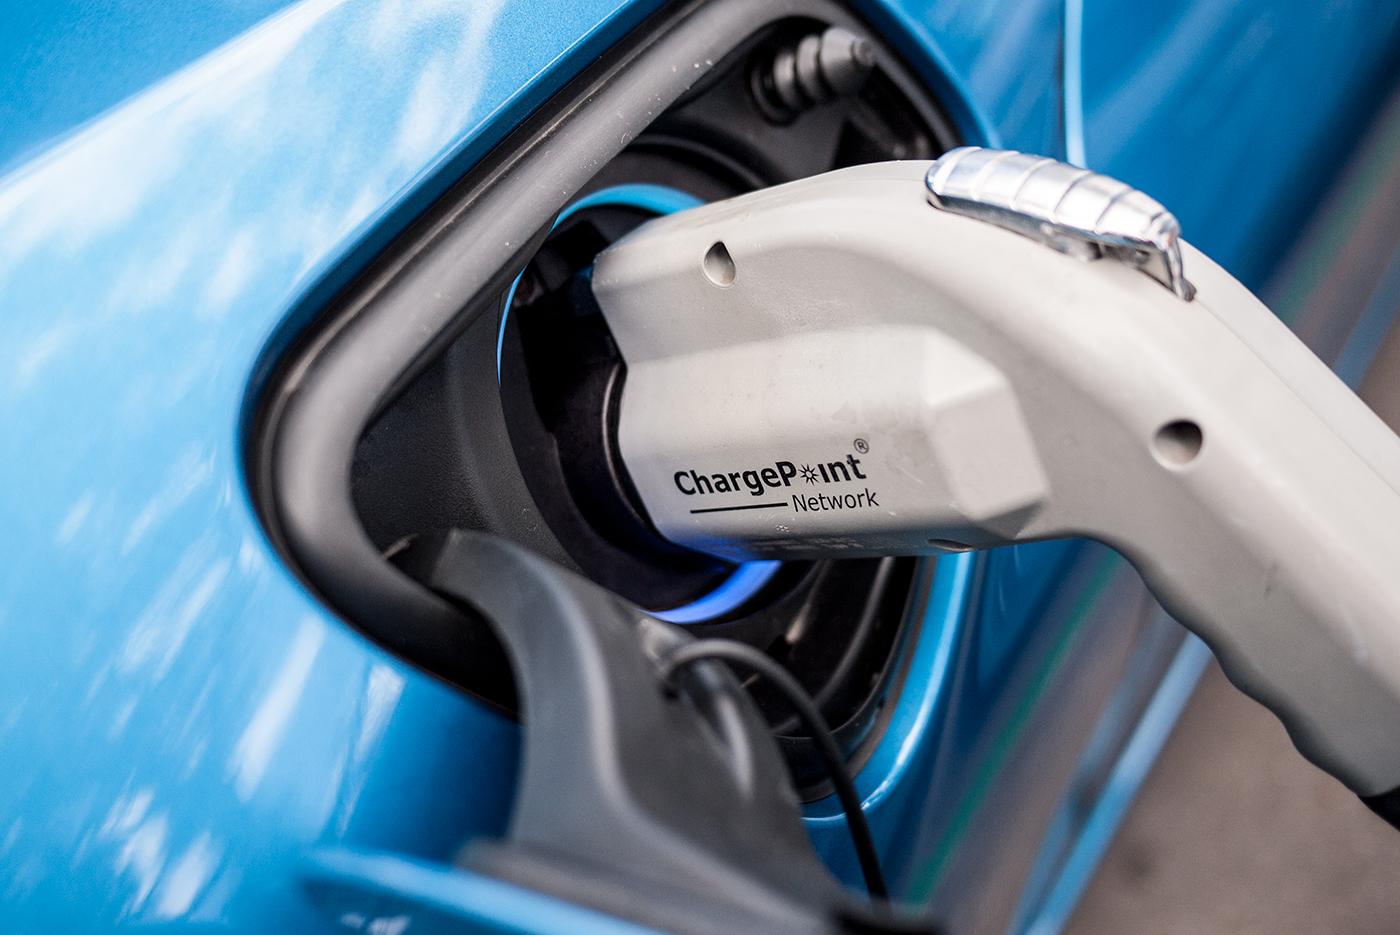 Electric Vehicle Sales Break Through One Million Barrier